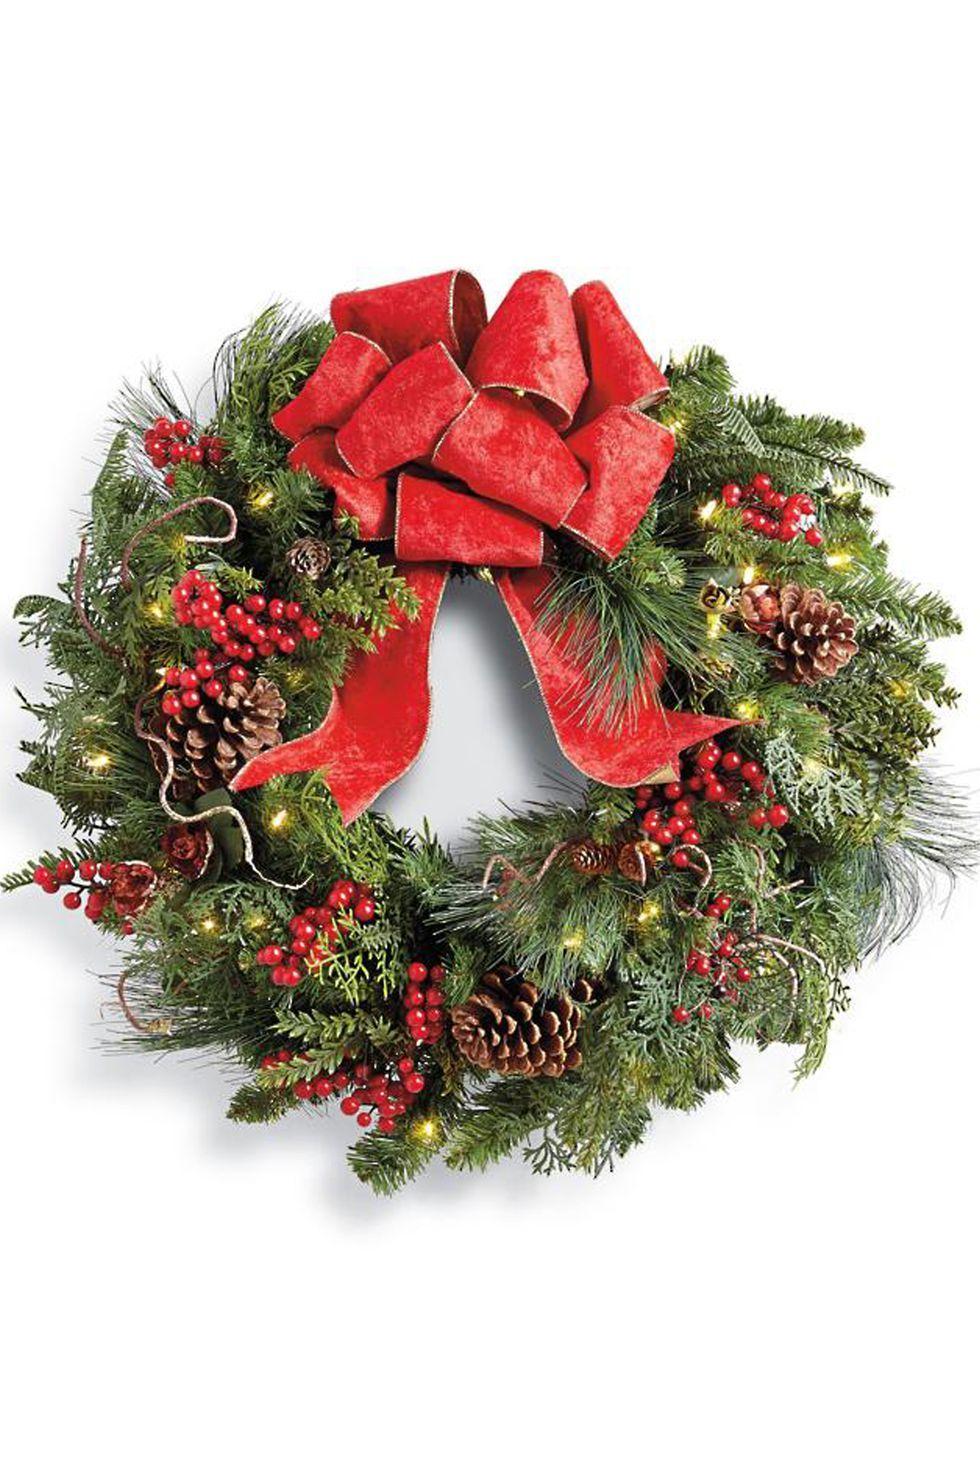 Image. Courtesy. Christmas Cheer Wreath